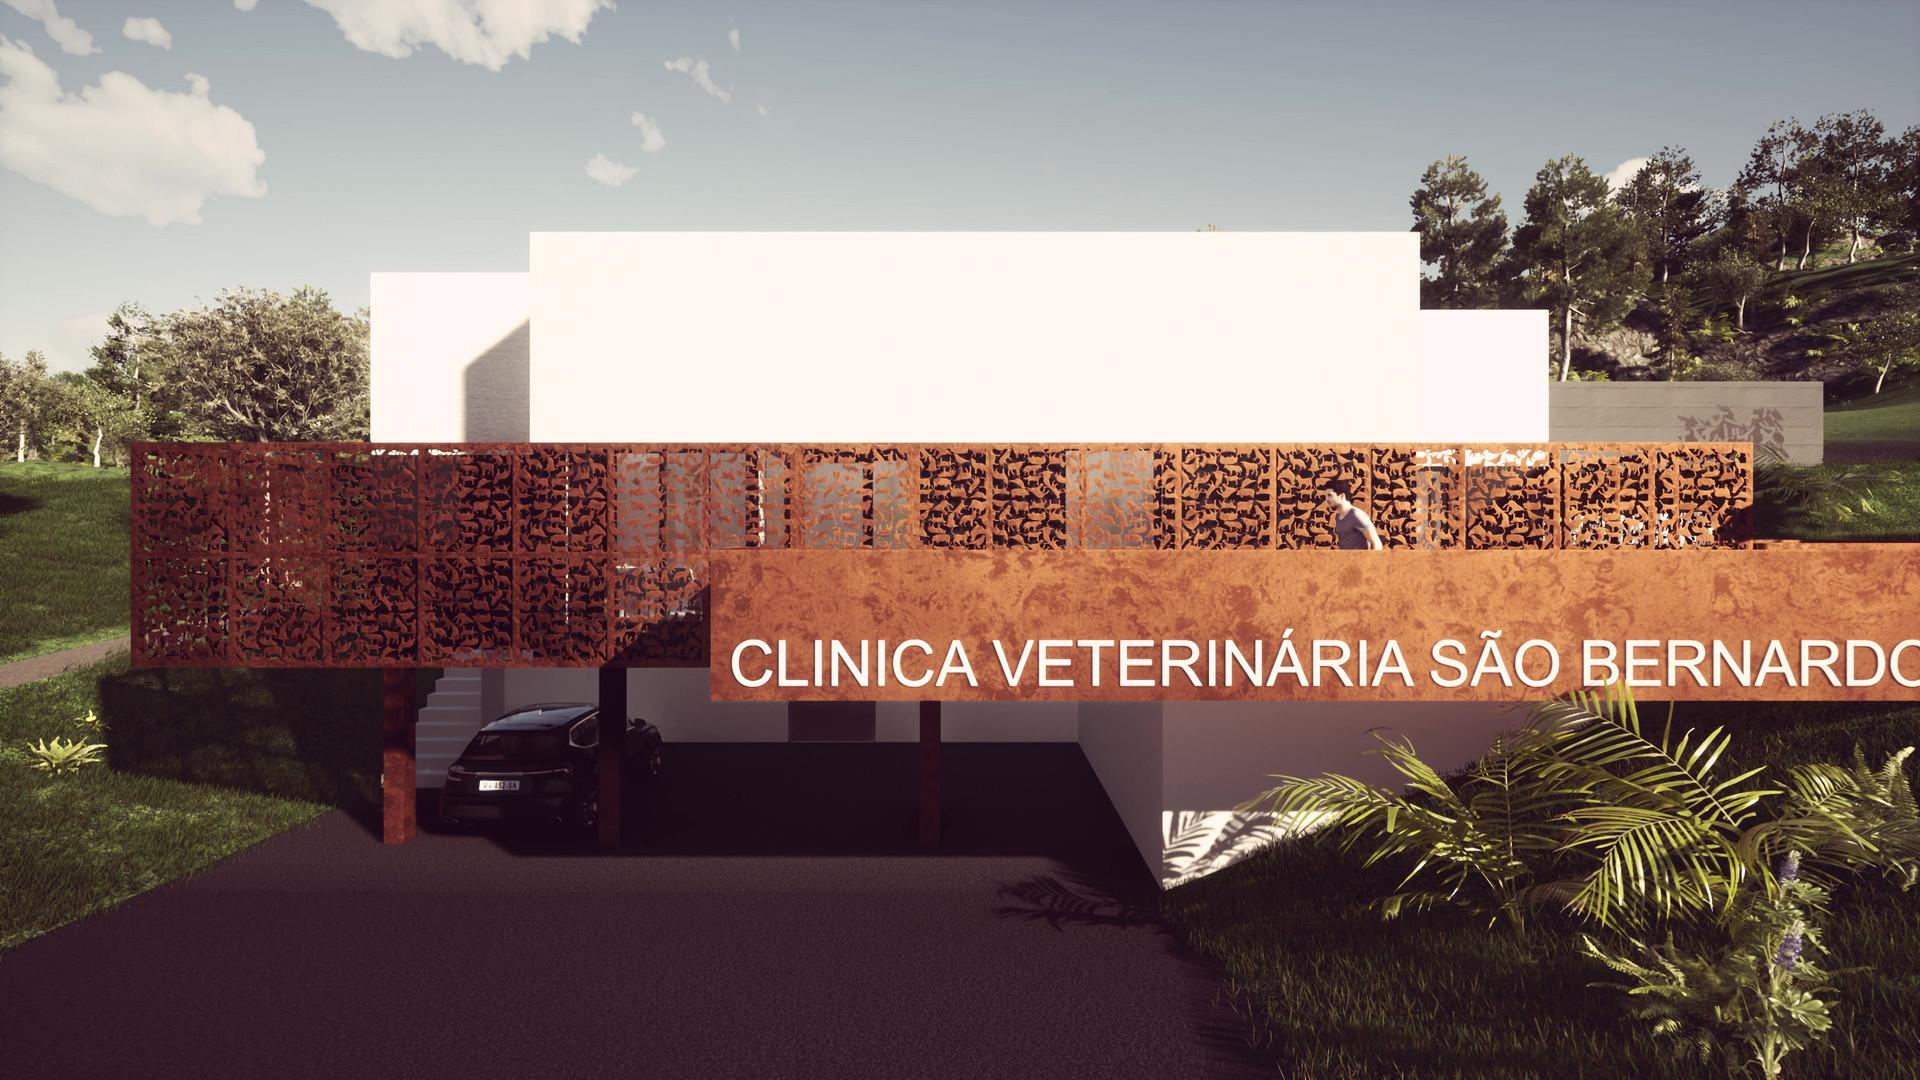 CLINICA_VETERINARIA SBRASA_ARQUITETOS_9.